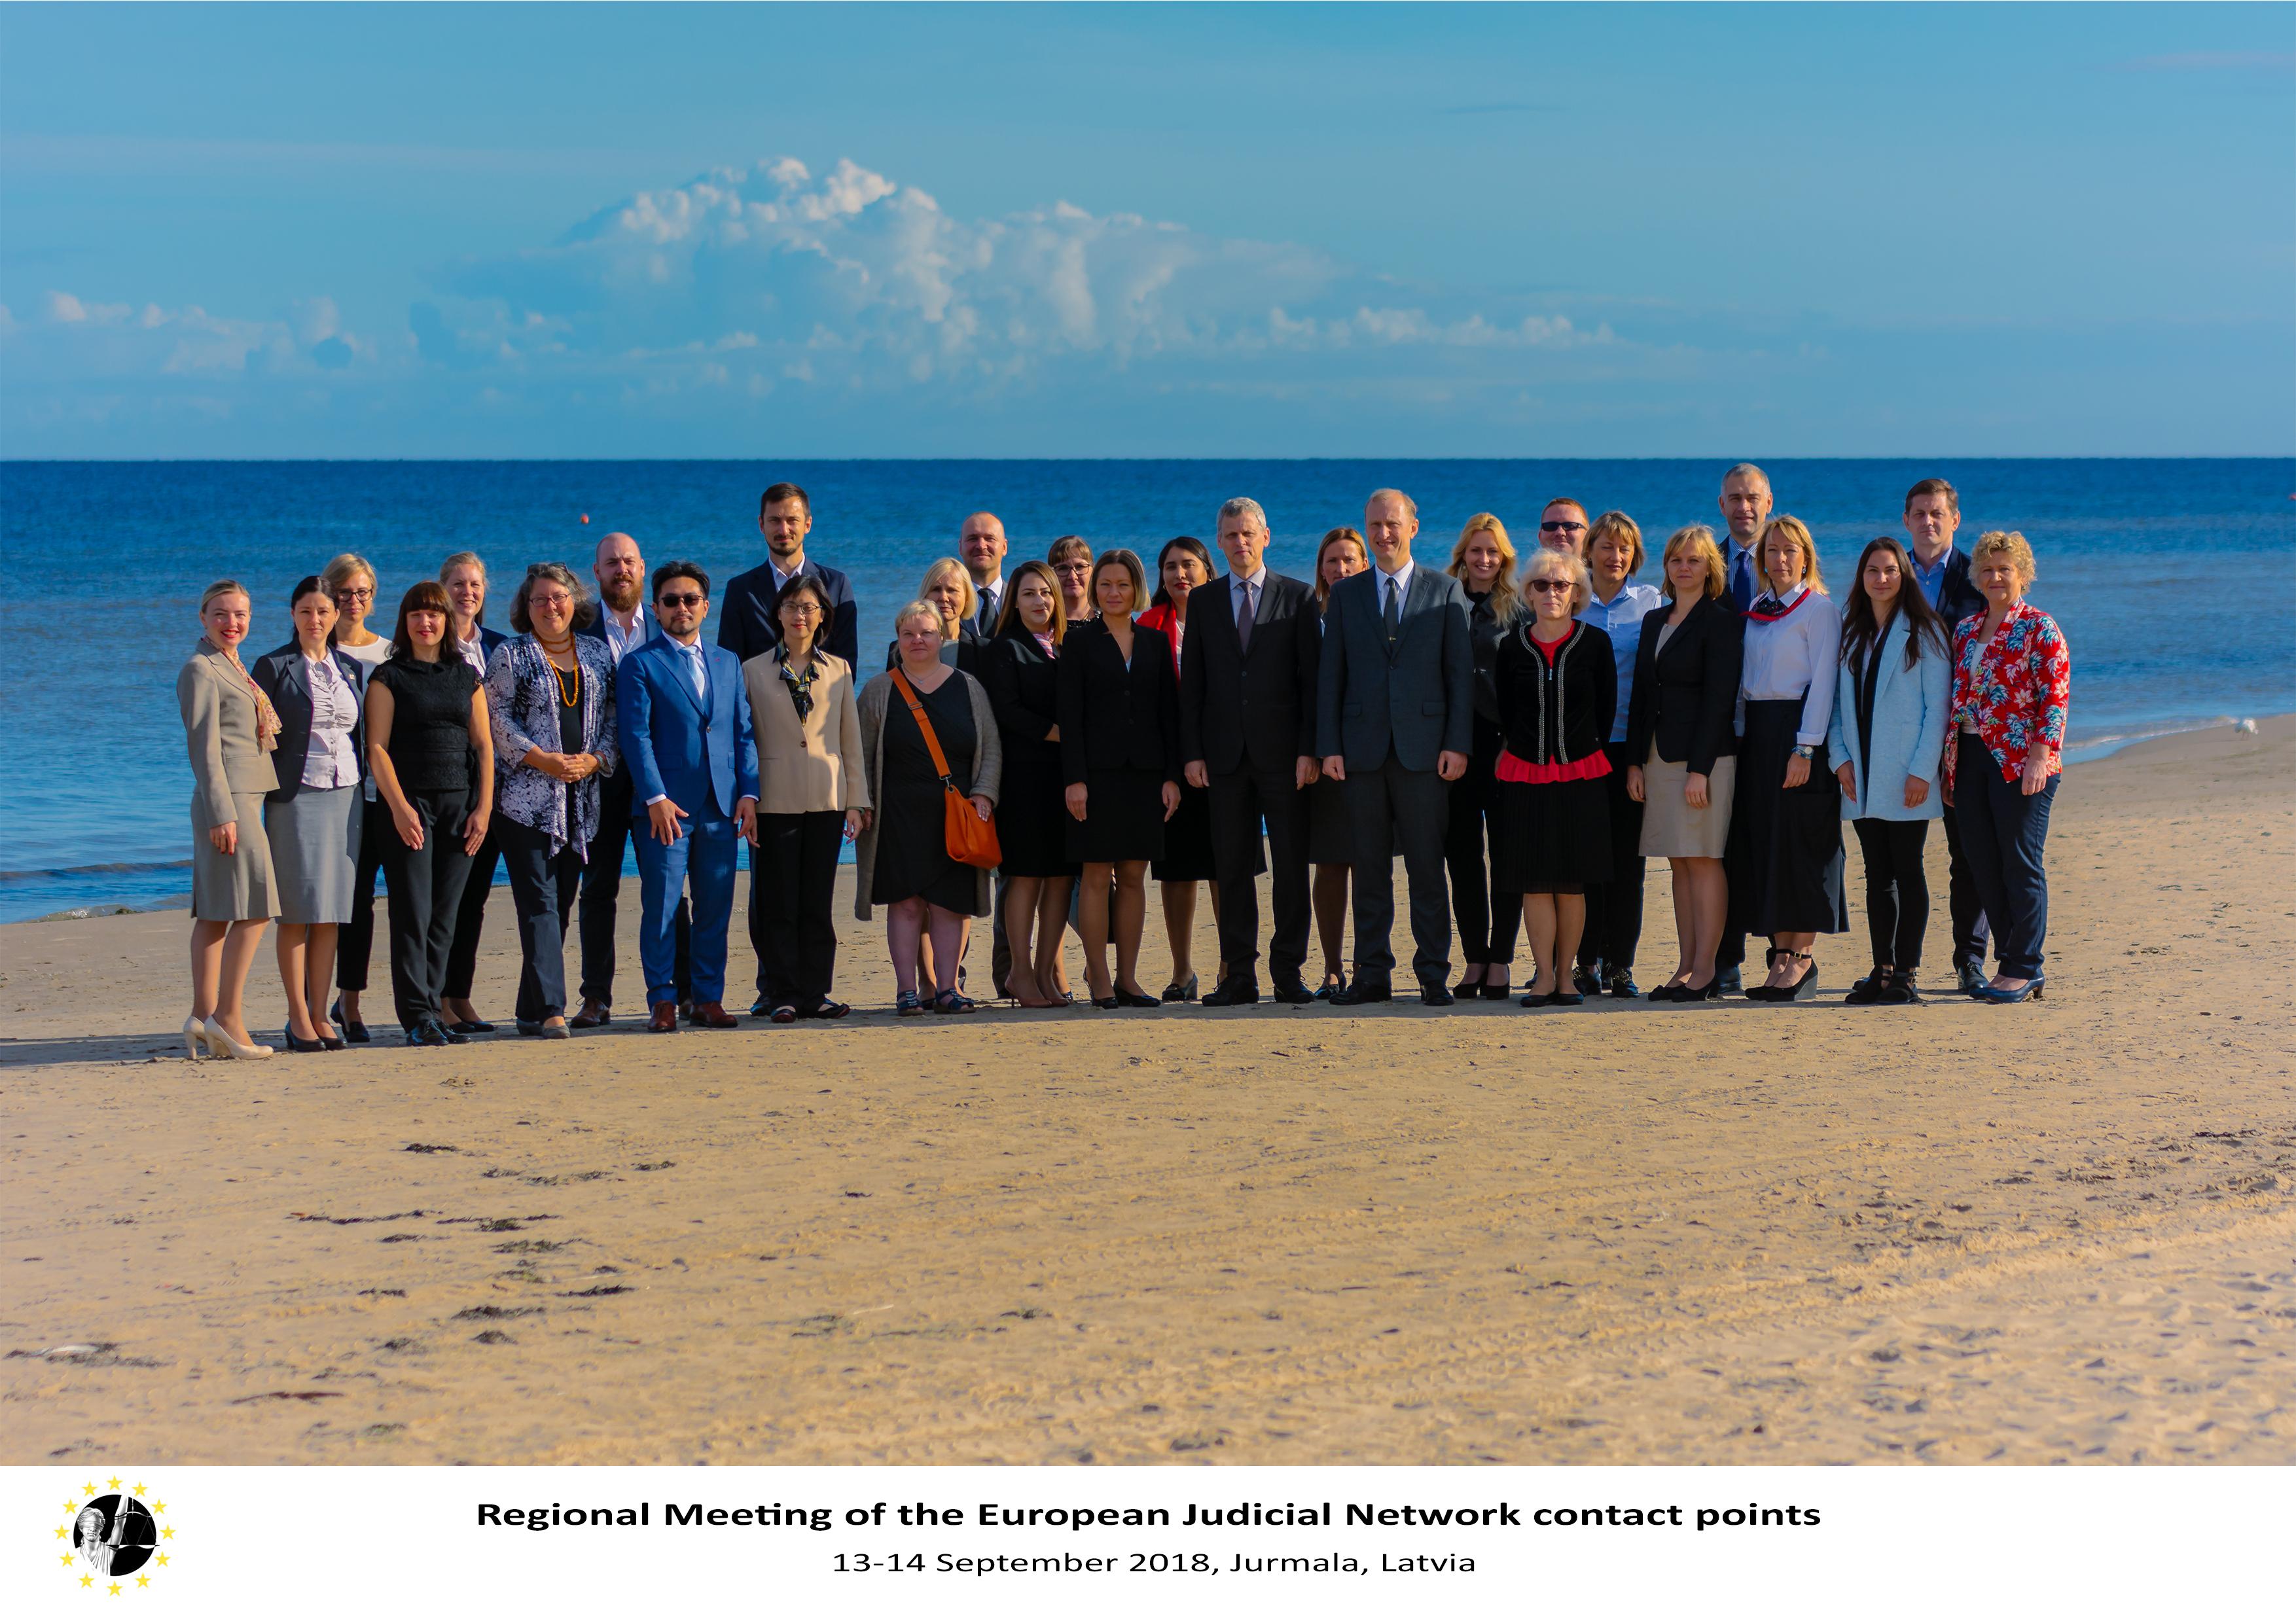 EJN Regional Meeting in Jurmala, Latvia ...